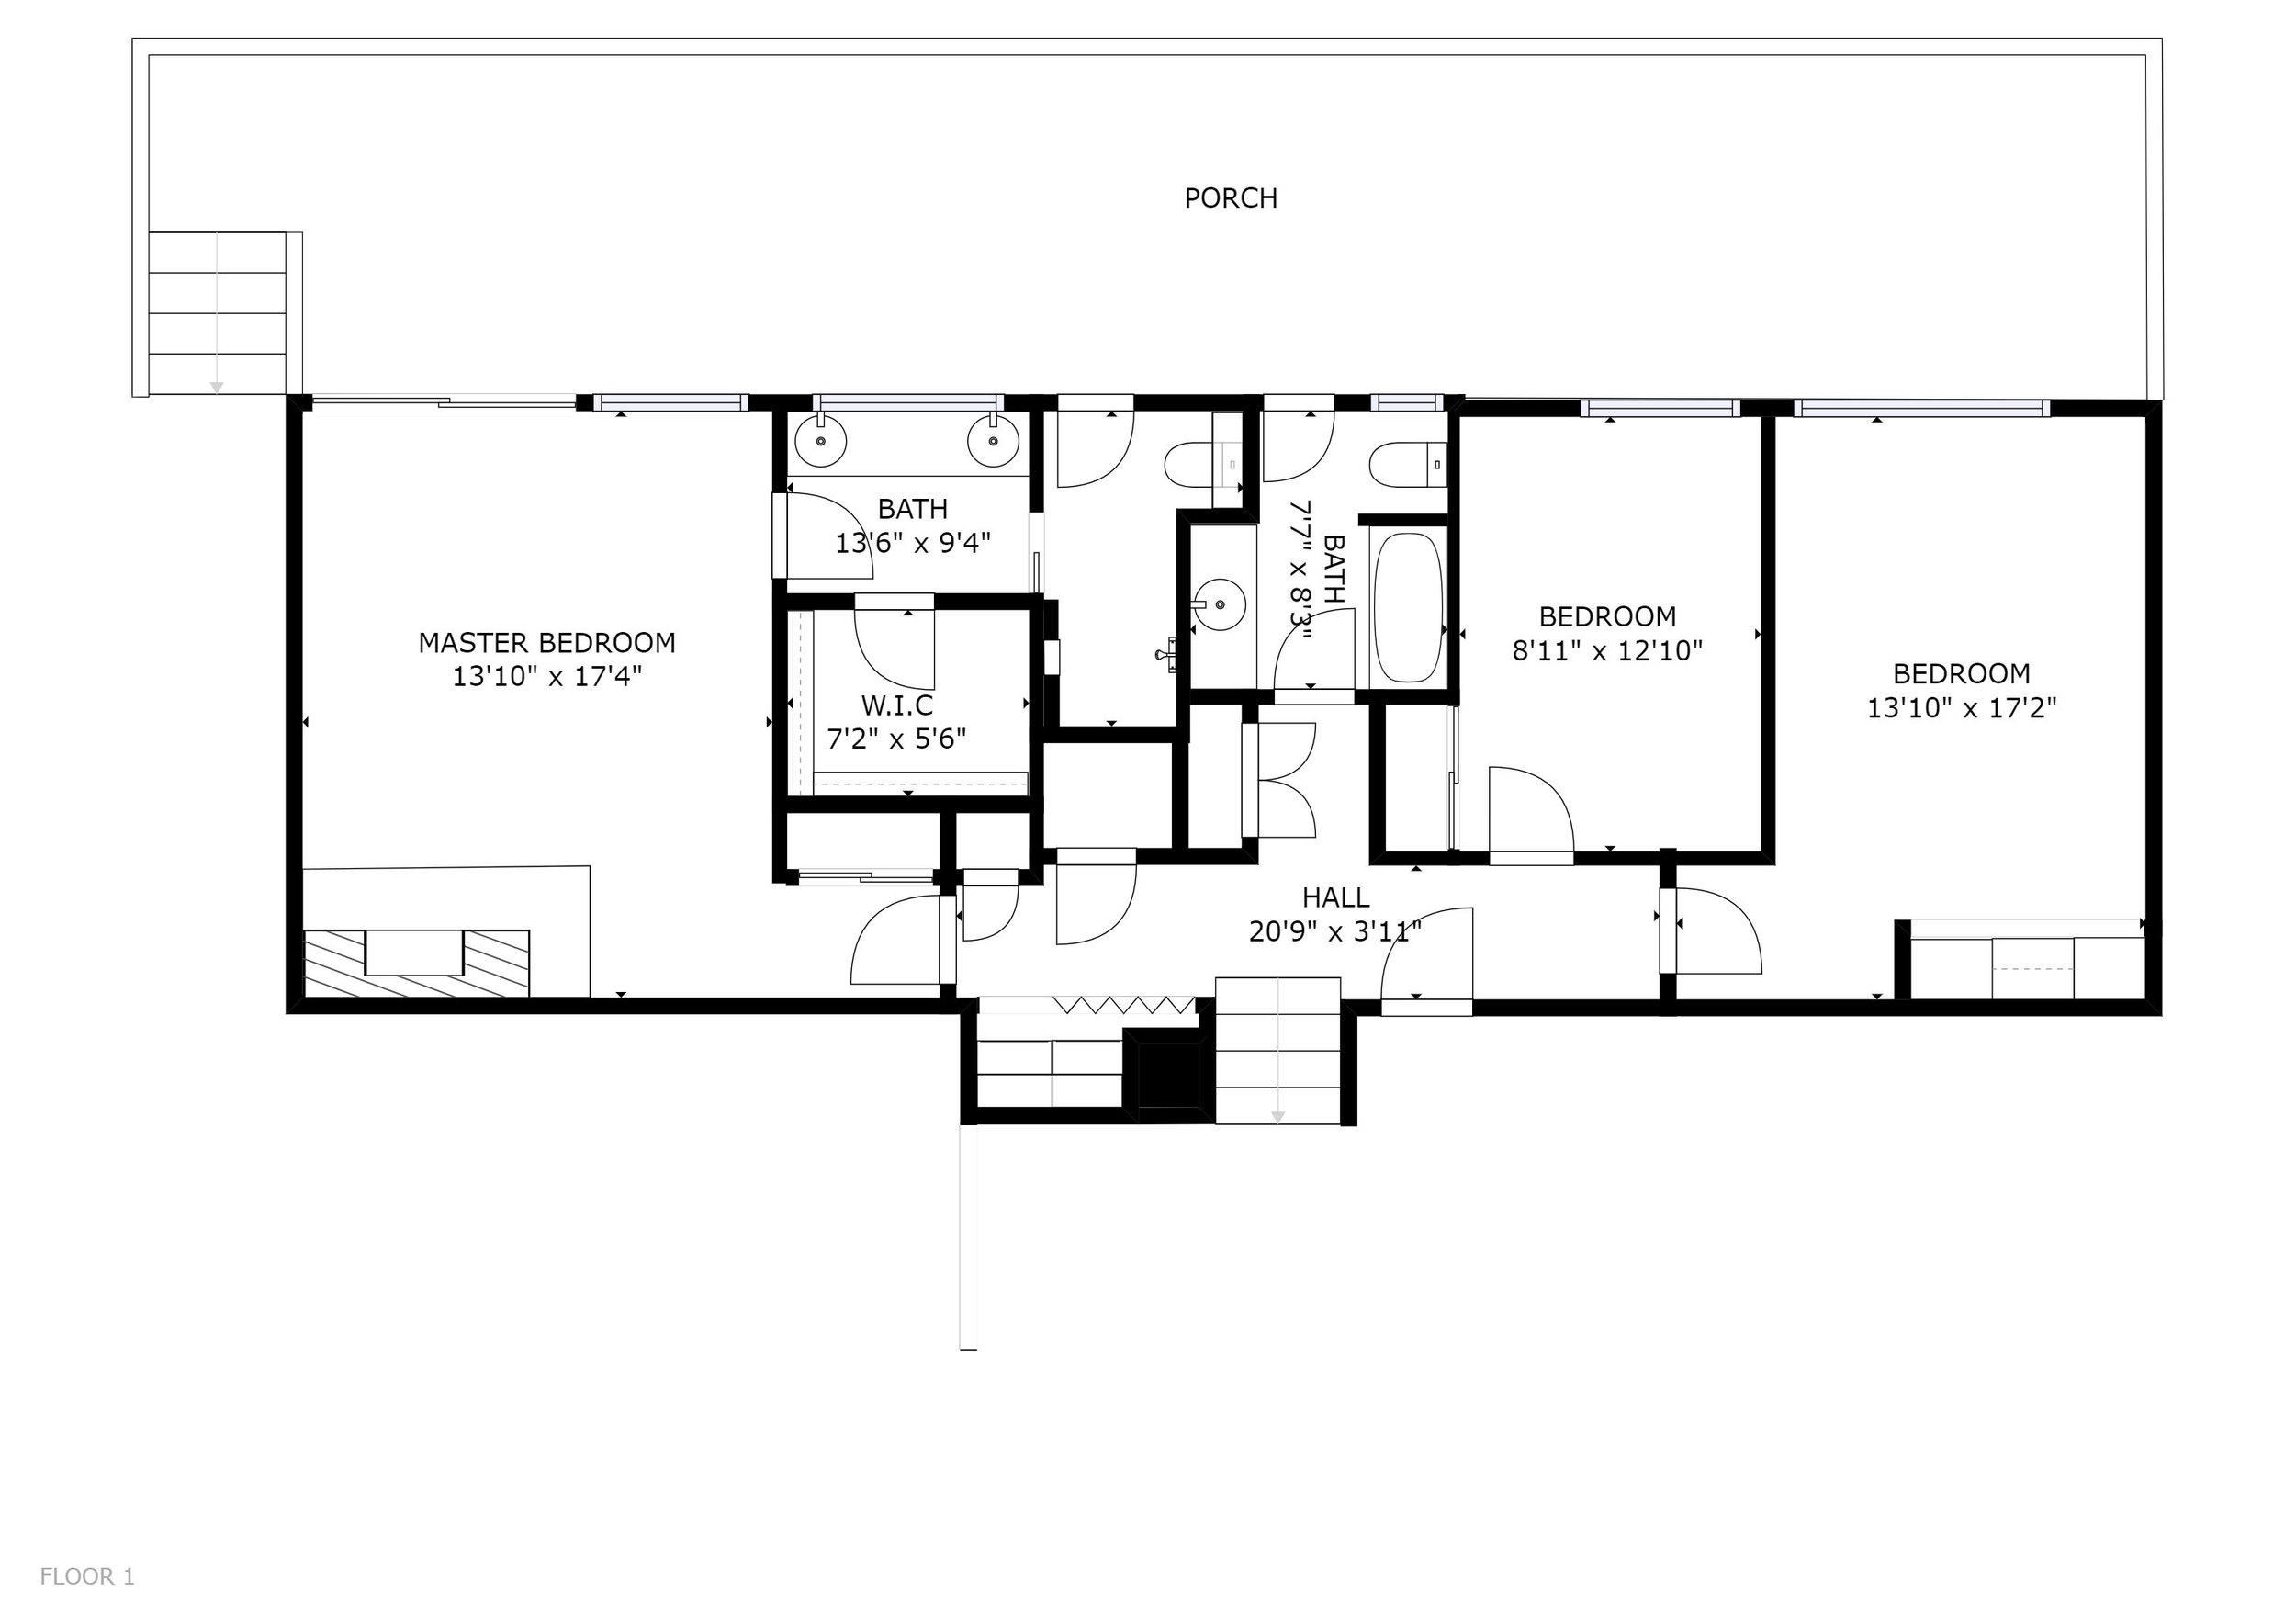 Bay Area Floor Plans Real Estate Photographer